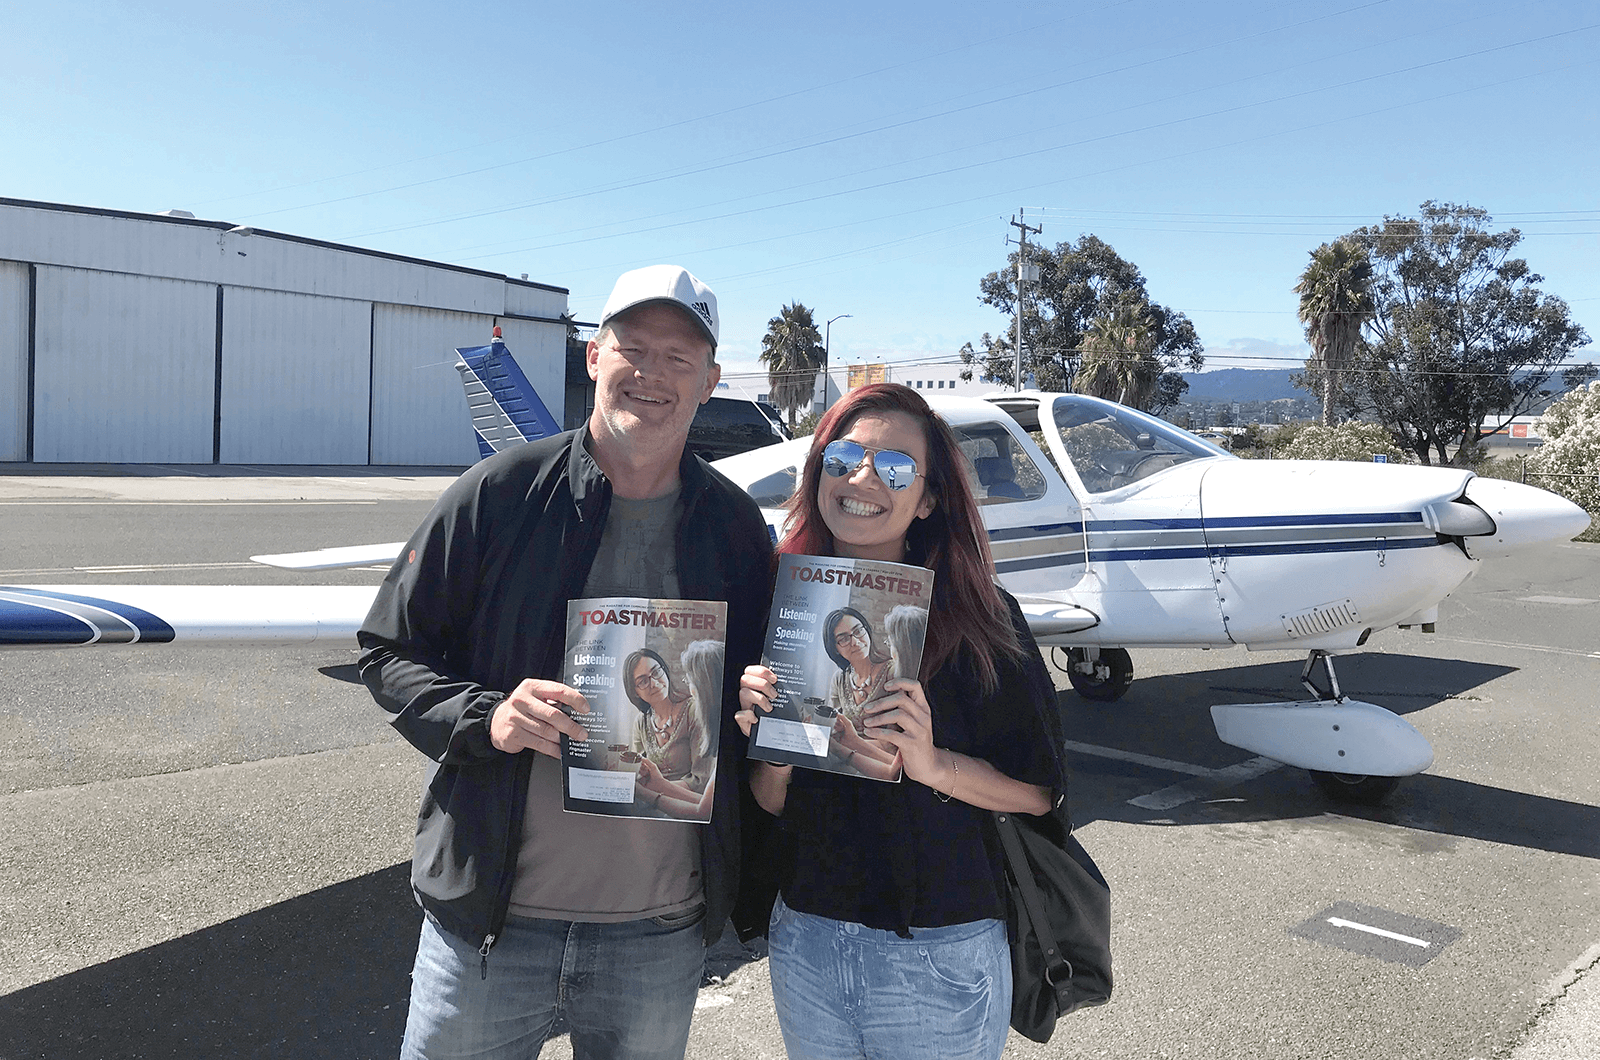 Nathan Mellin, DTM, takes fellow club member Karena Yim, both of San Francisco, California, for a flight around the area.